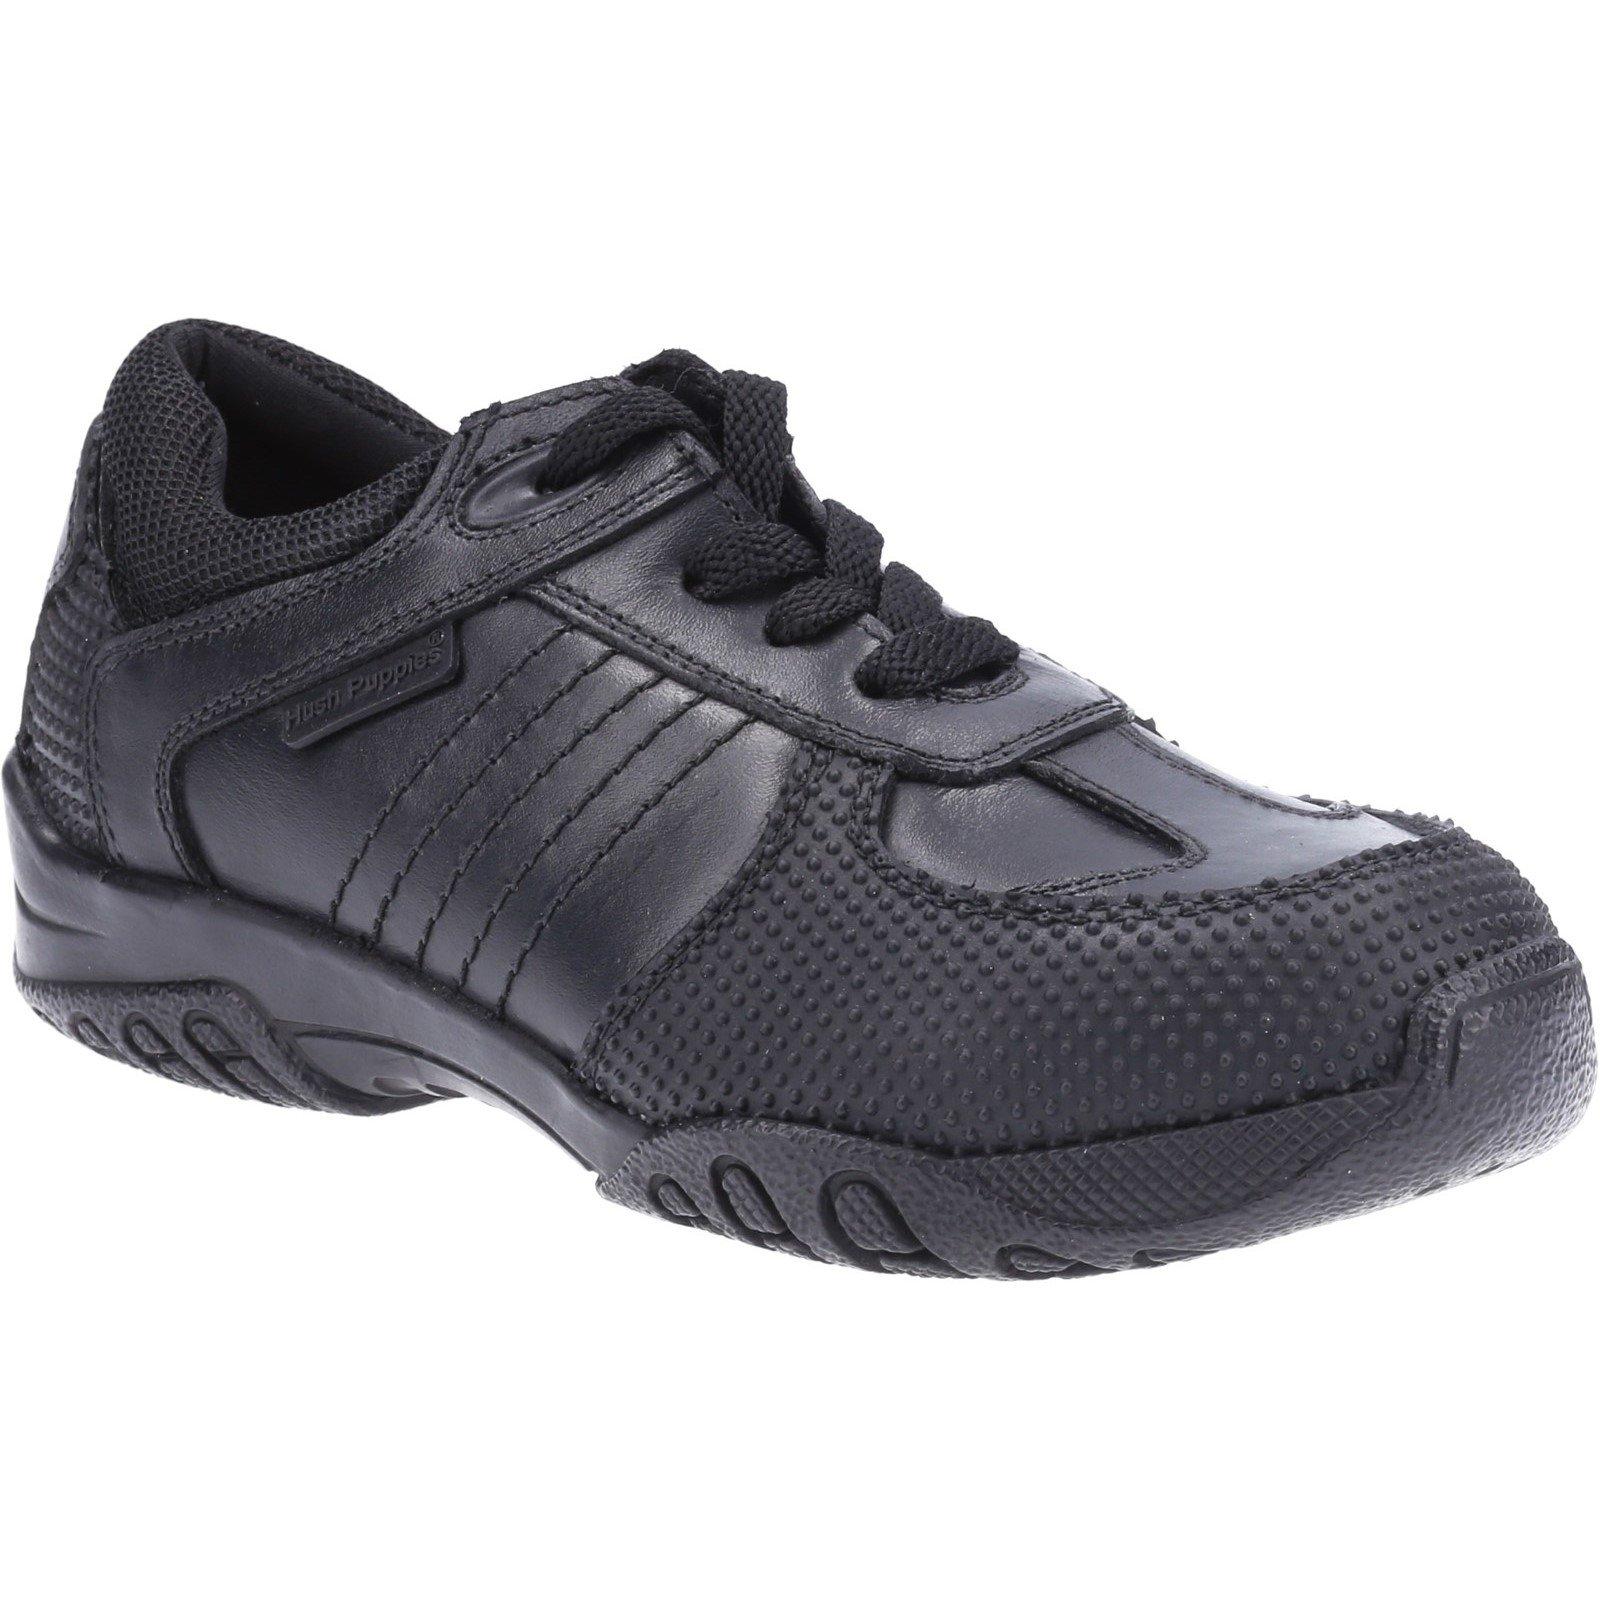 Hush Puppies Kid's Jezza Junior School Shoe Black 32587 - Black 13